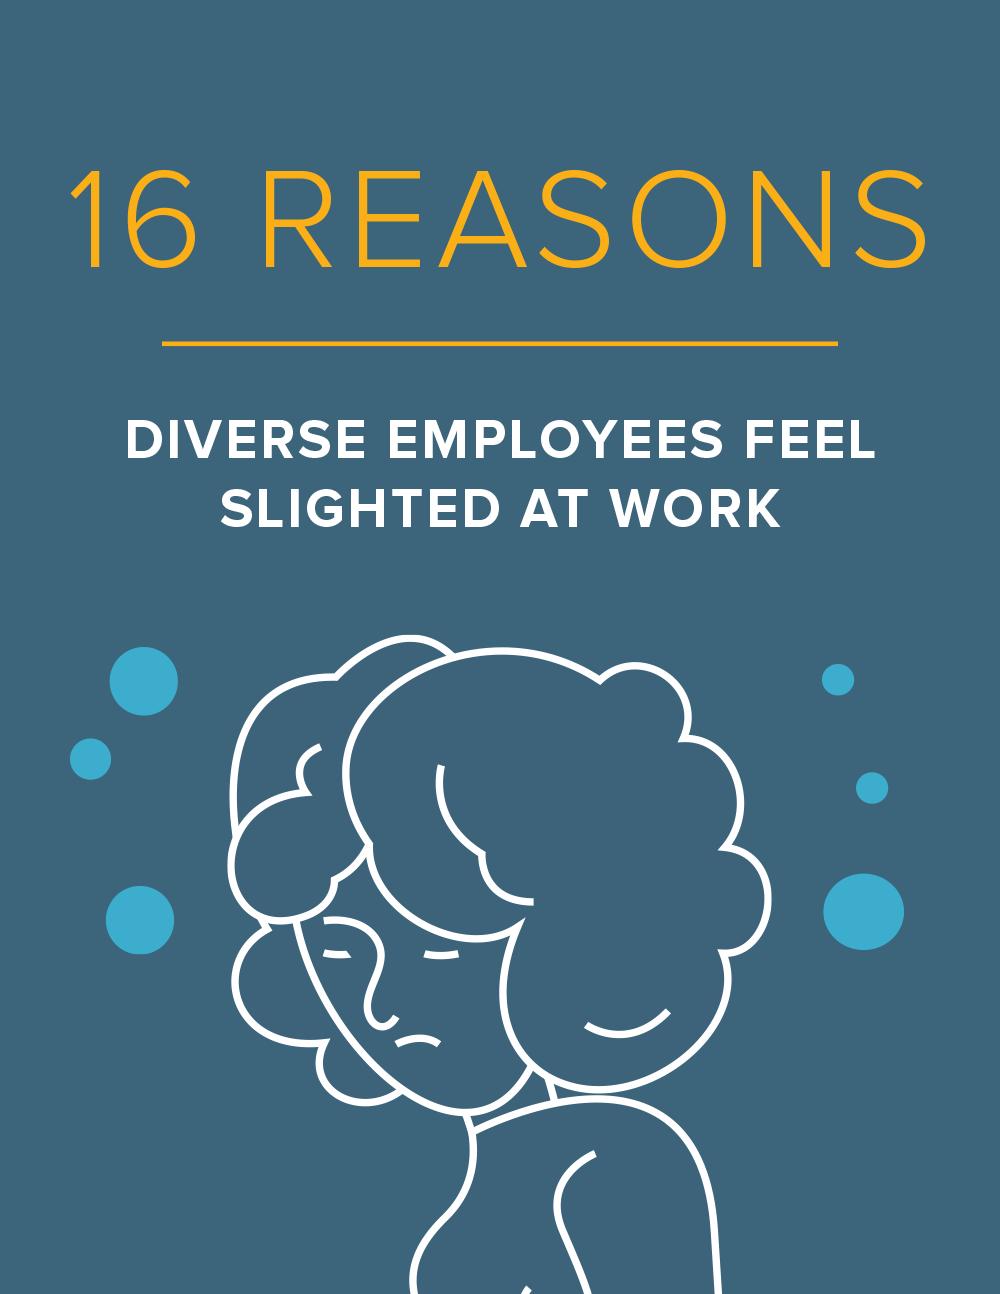 NEOGOV 16 Reasons Diverse Employees Feel Slighted